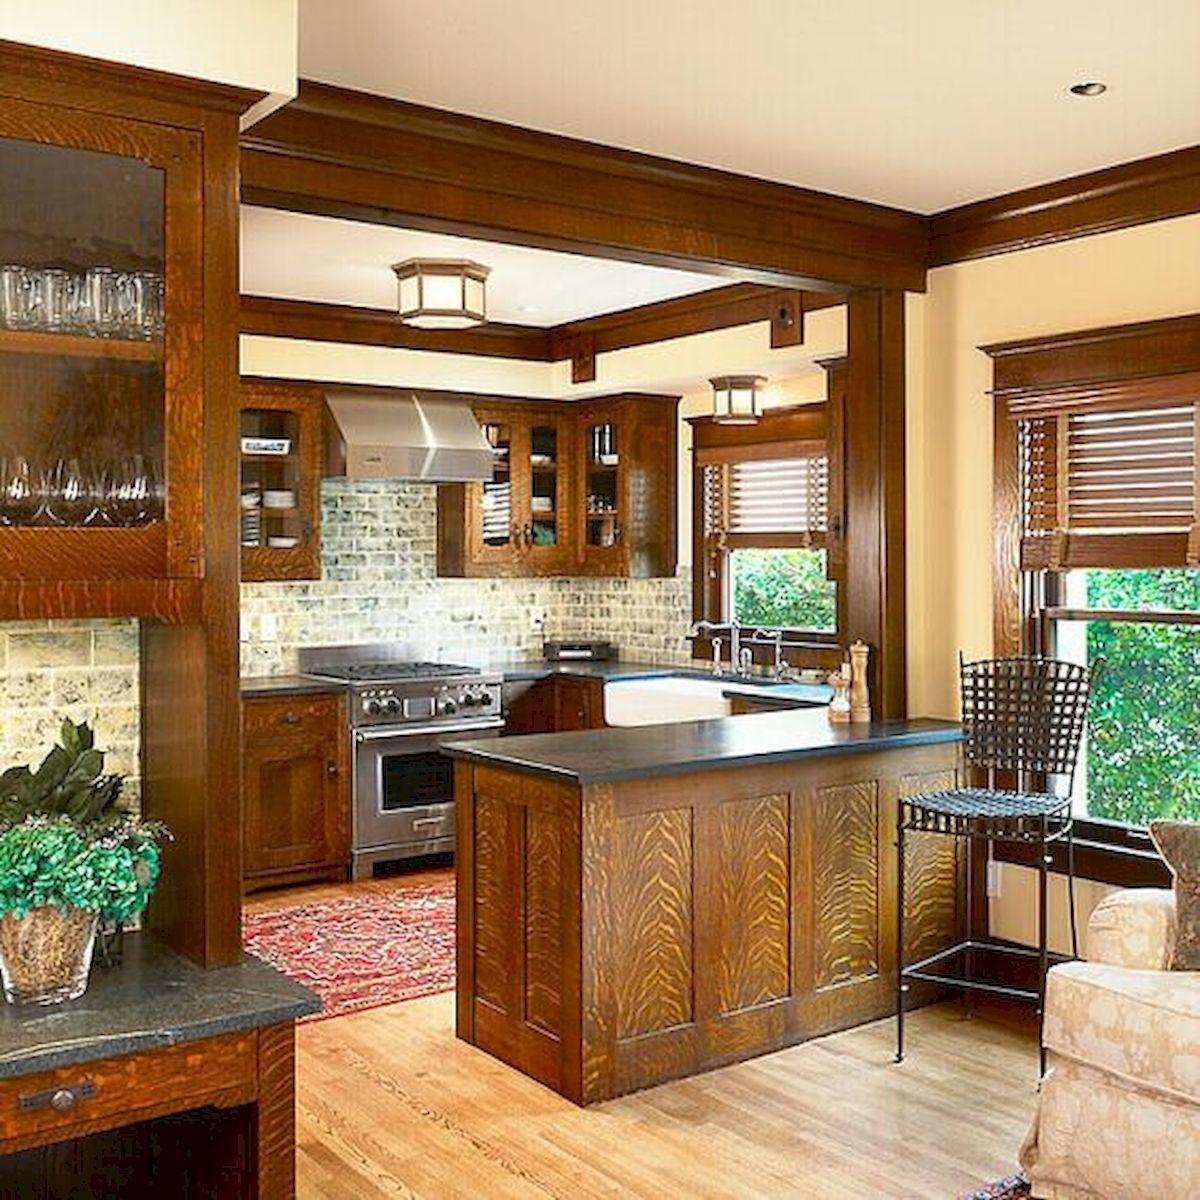 40 awesome craftsman style kitchen design ideas 11 on awesome modern kitchen design ideas id=15183